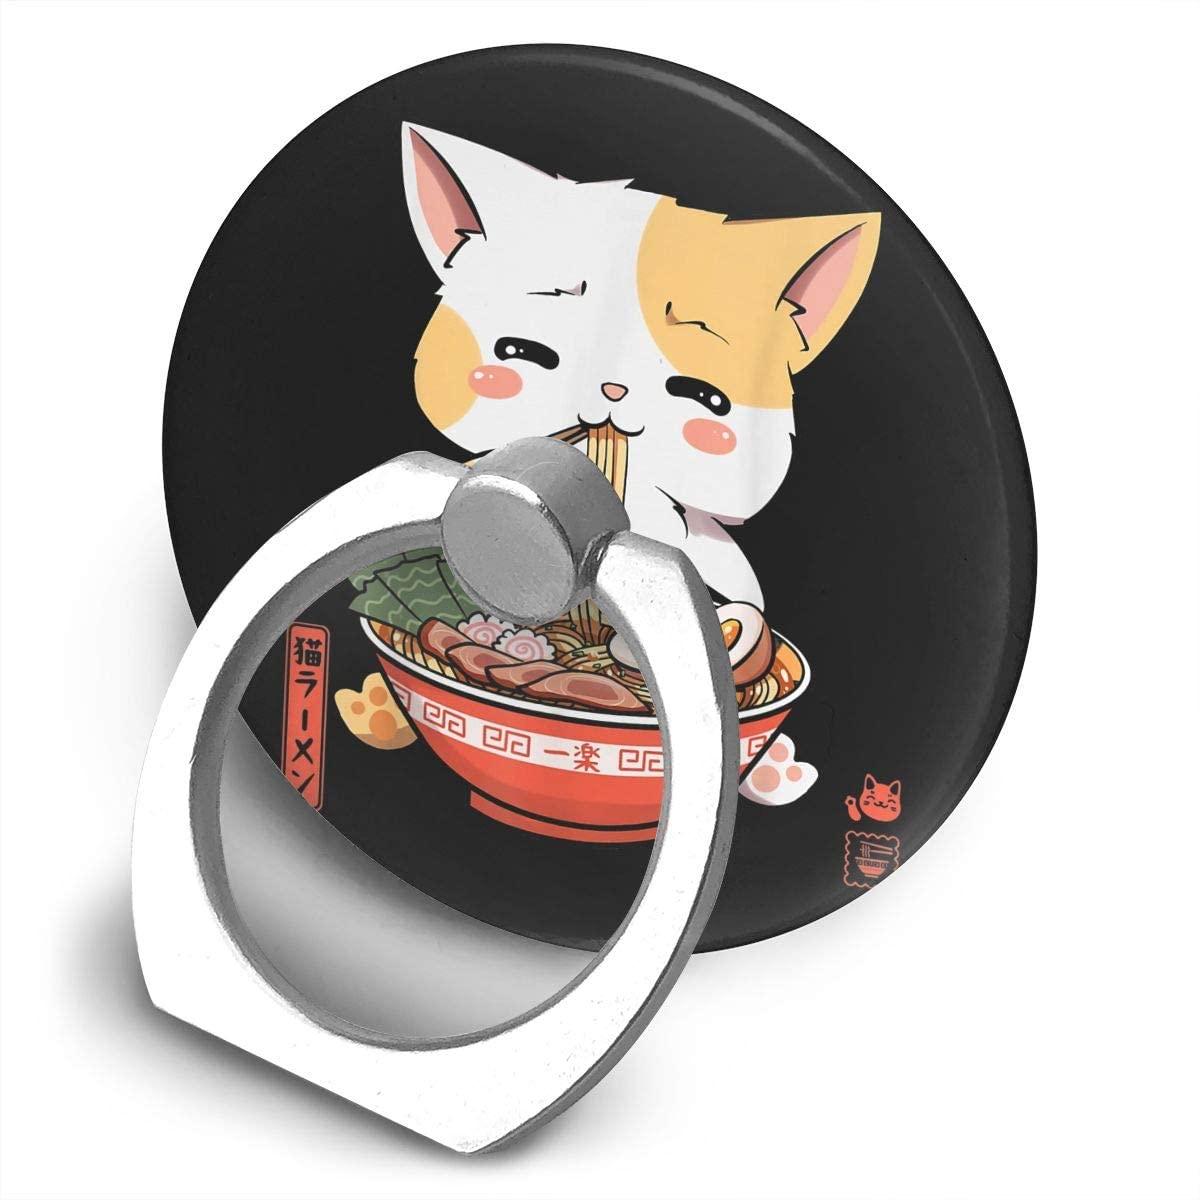 Zwinz Kawaii Neko Cat Ramen Bowl Anime Japanese Alloy Mobile Phone Ring Bracket,360 Degree Rotating Ring Stand Grip Mounts